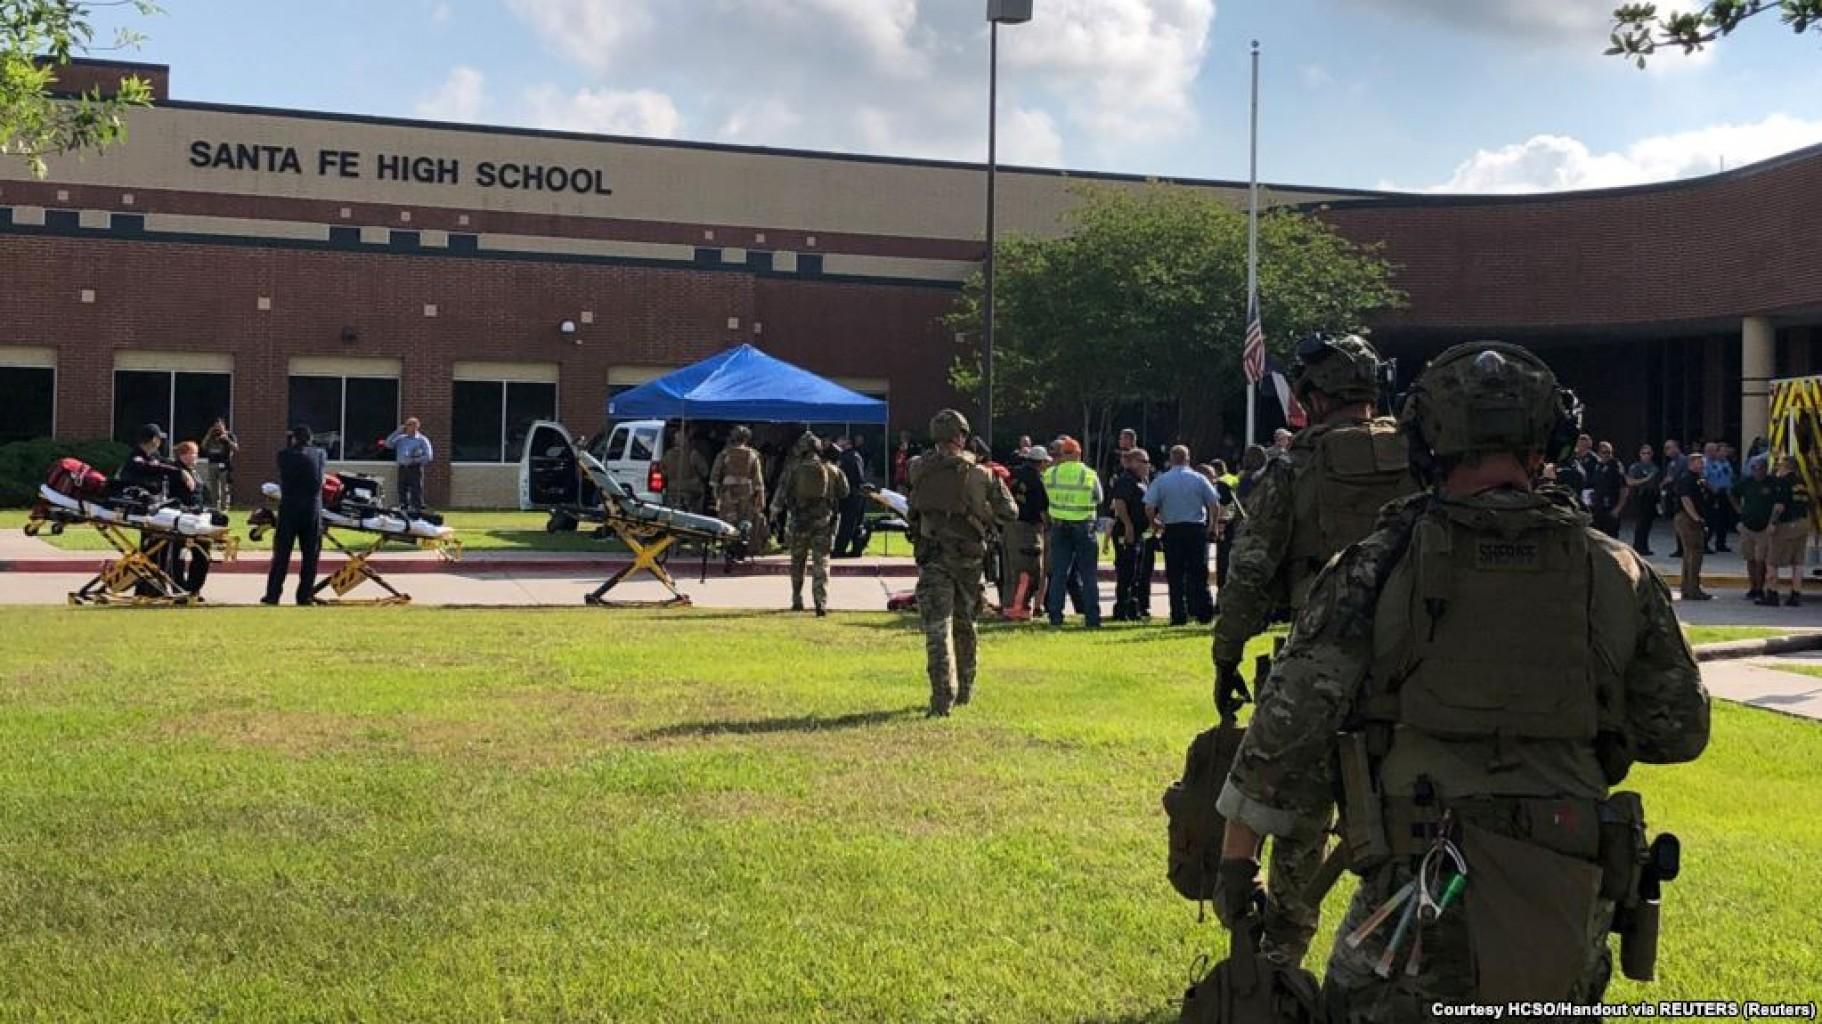 Gobernador de Texas revela plan para  reducir violencia de arma en las escuelas